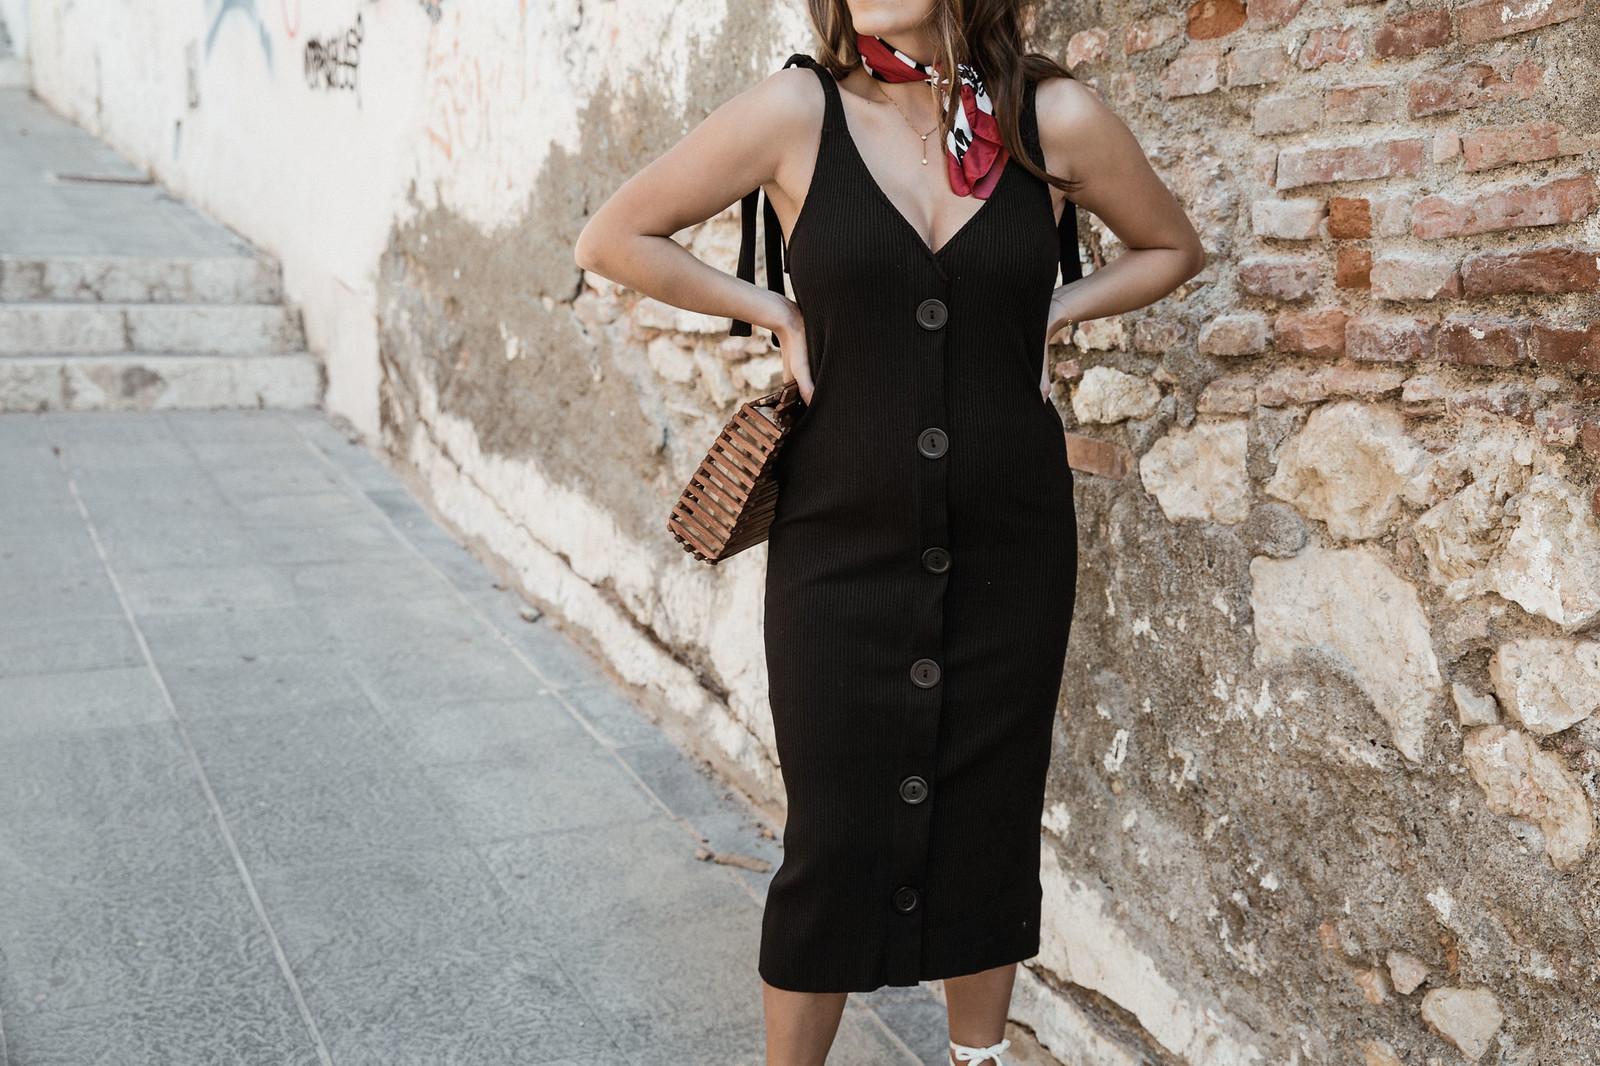 seams for a desire - jessie chanes - black tight dress - zara-8